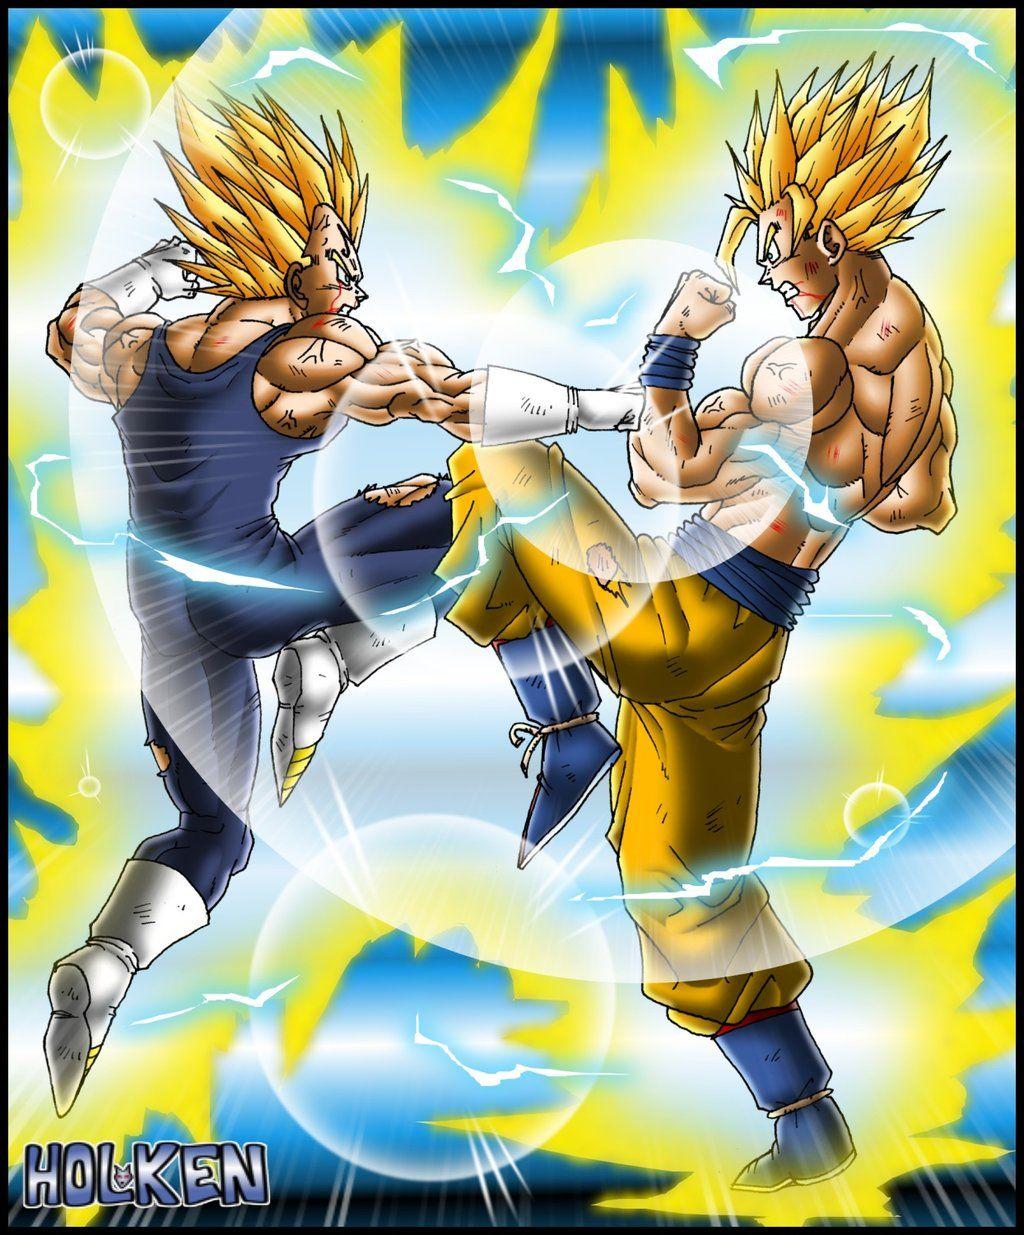 Majin Vegeta Vs Goku By Dbzwarrior On Deviantart Dragonball Z